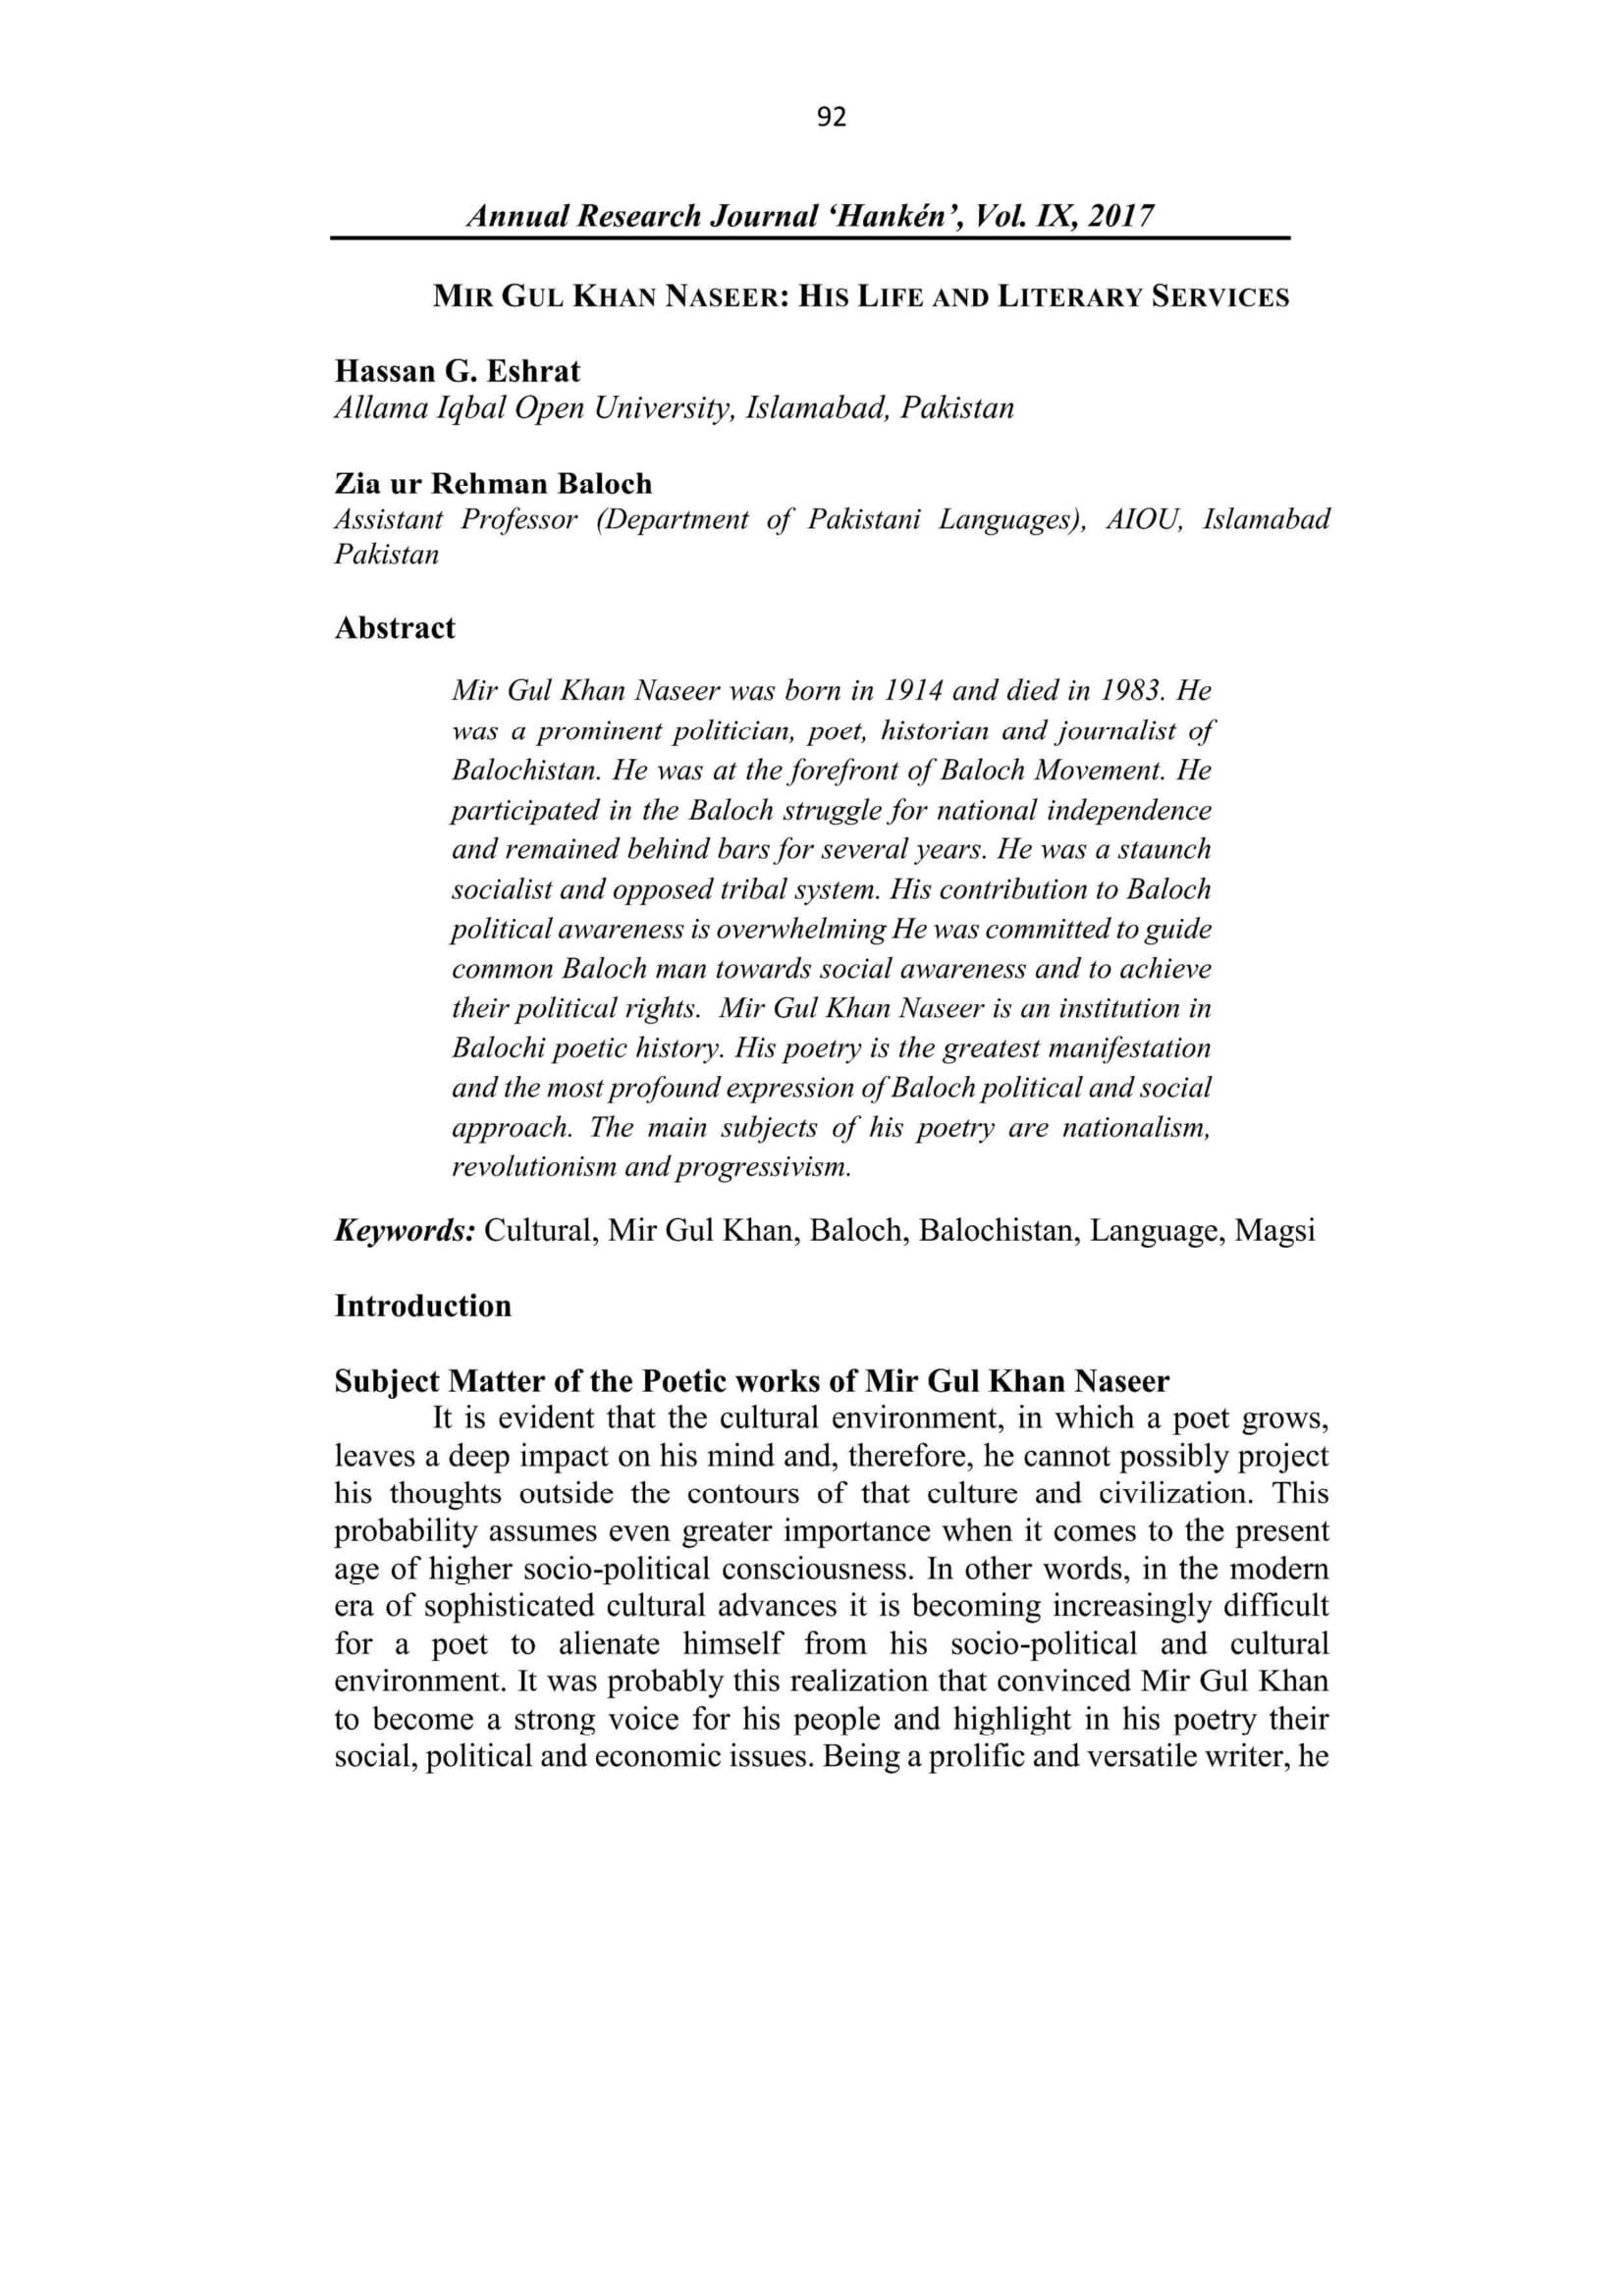 MIR GUL KHAN NASEER: HIS LIFE AND LITERARY SERVICESMIR GUL KHAN NASEER: HIS LIFE AND LITERARY SERVICES